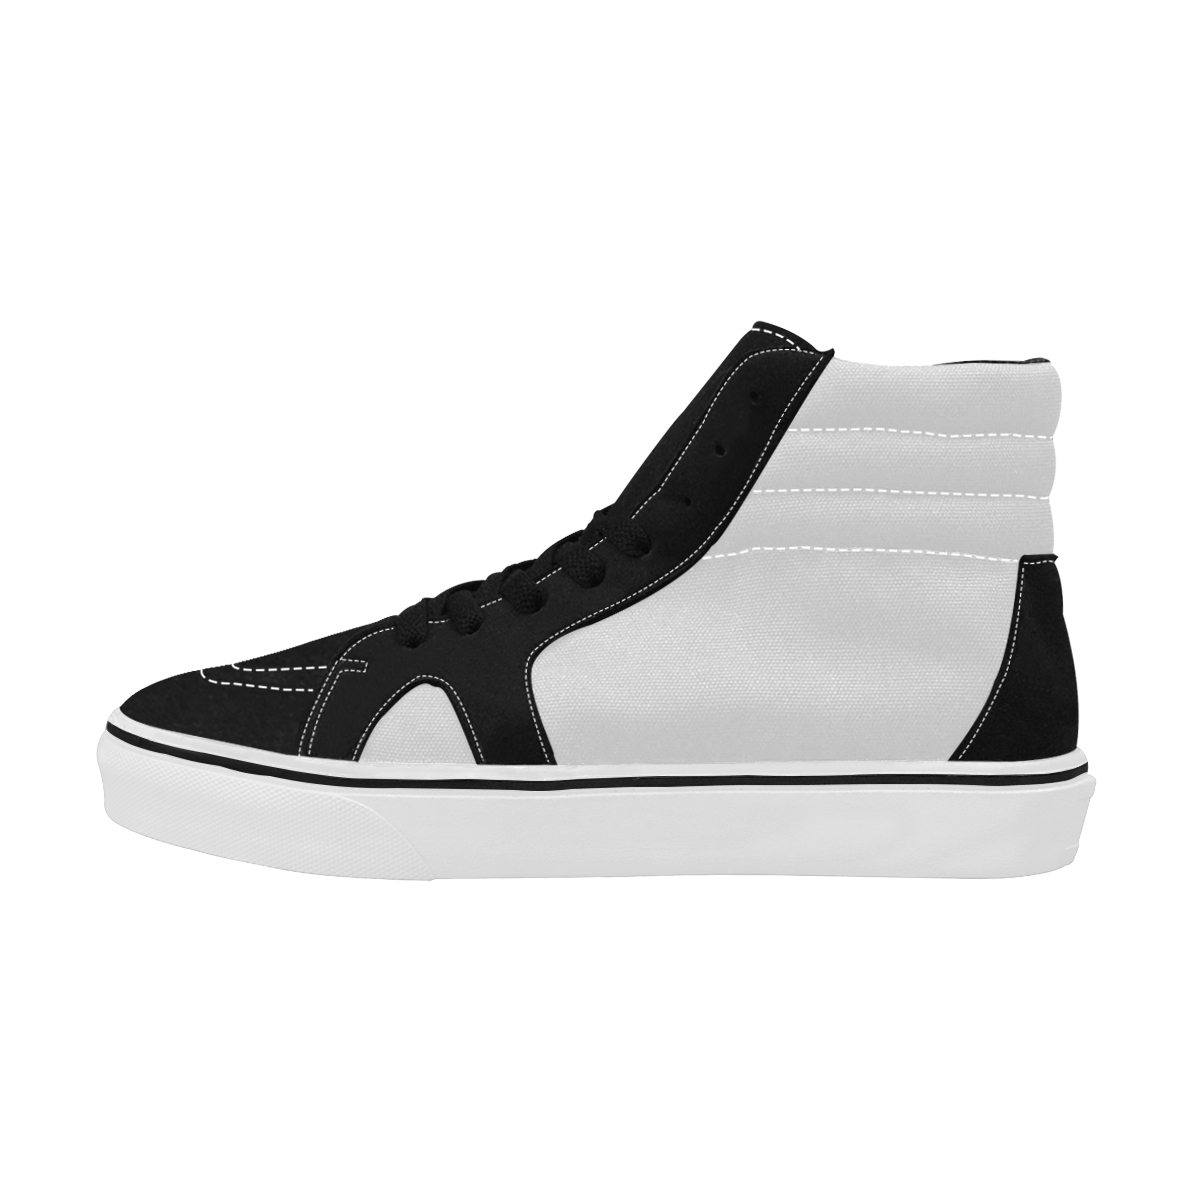 Women's High Top Skateboarding Shoes/Large (Model E001-1)